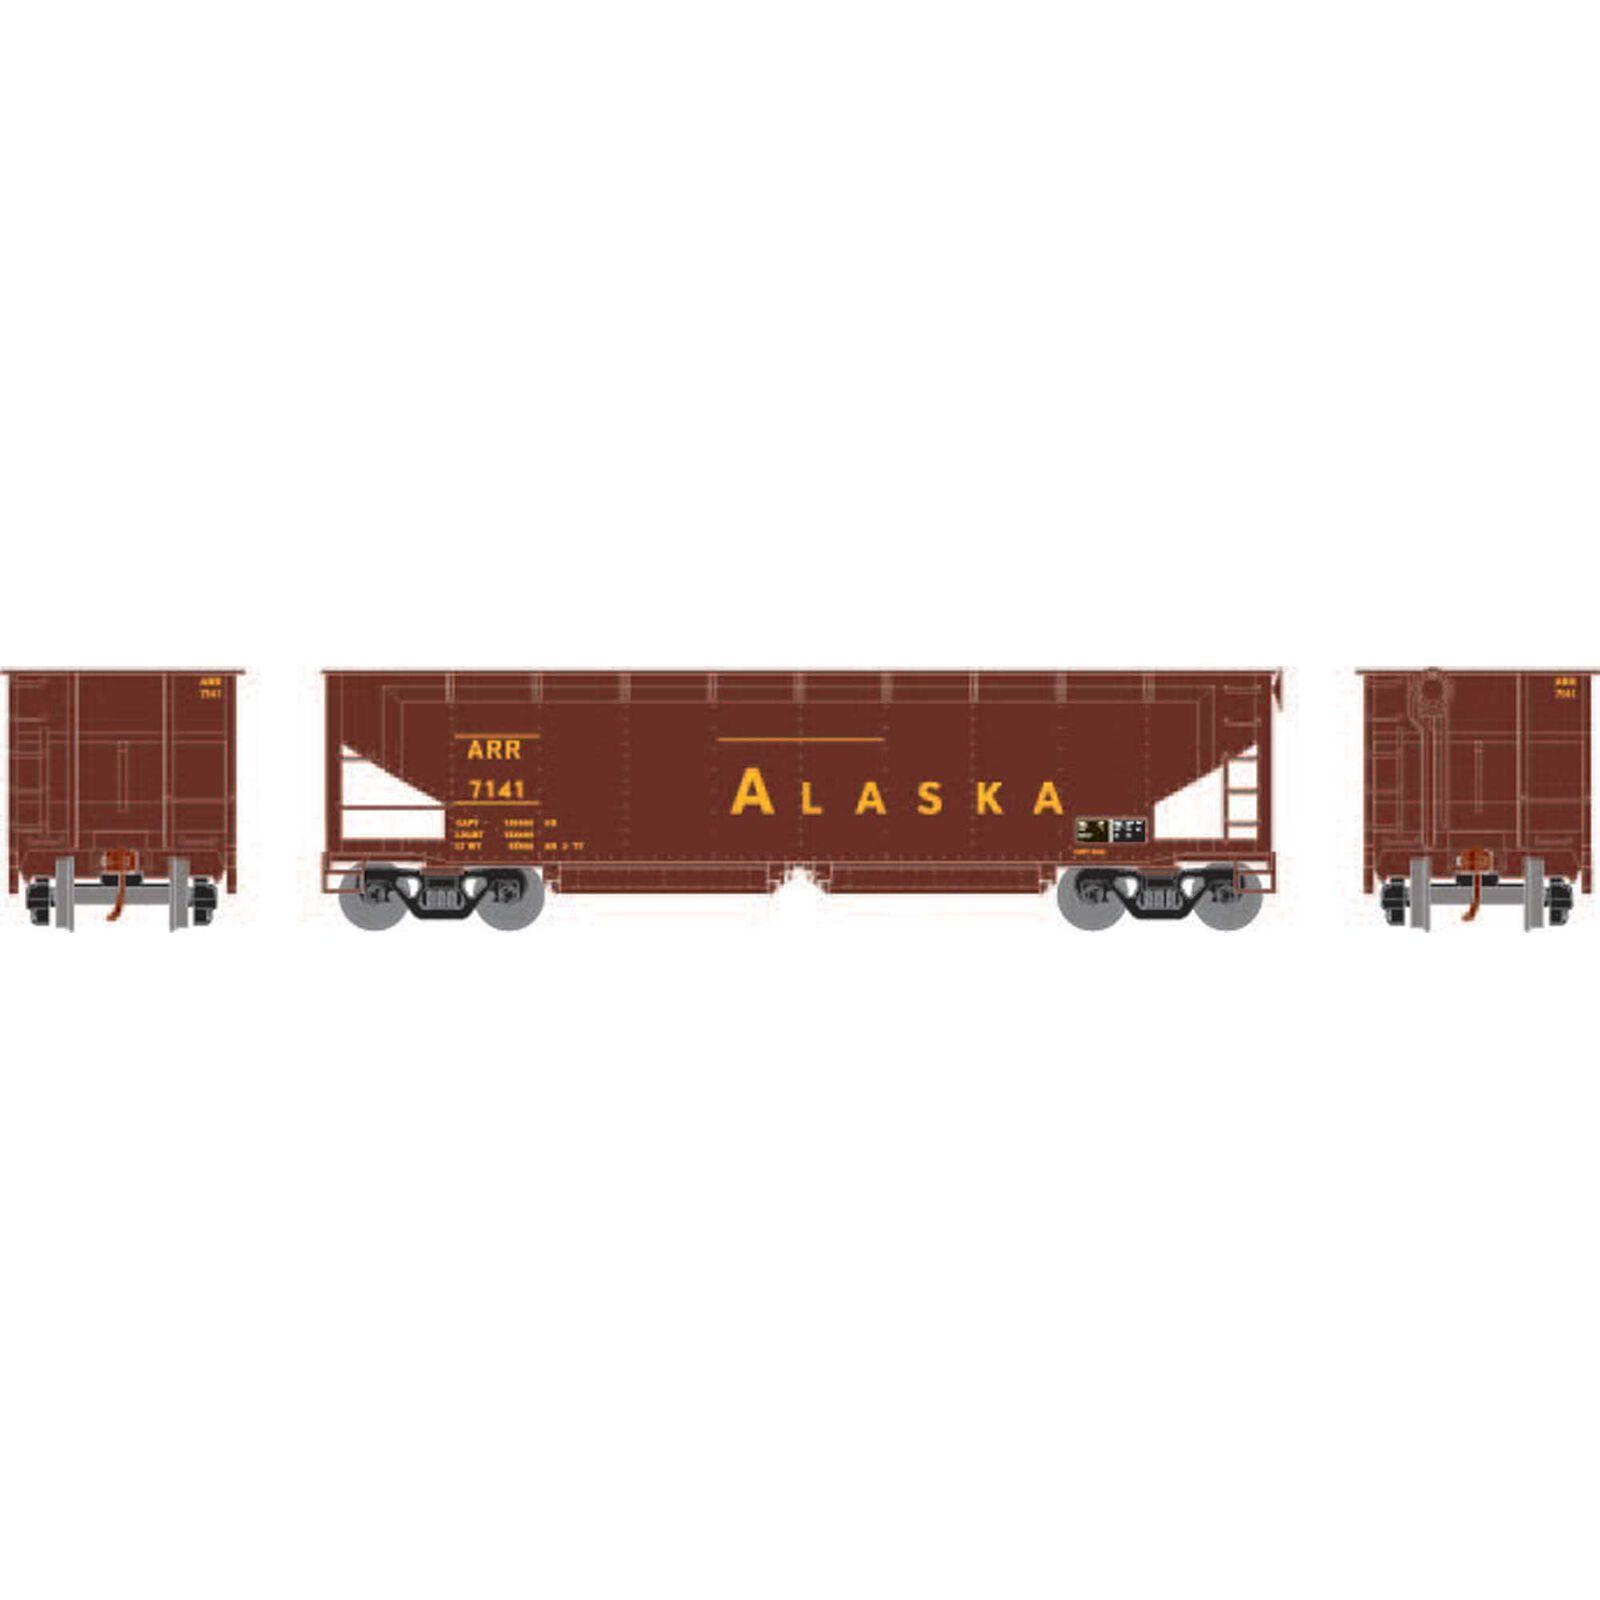 HO RTR 40' Offset Ballast Hopper with Load, ARR #7141